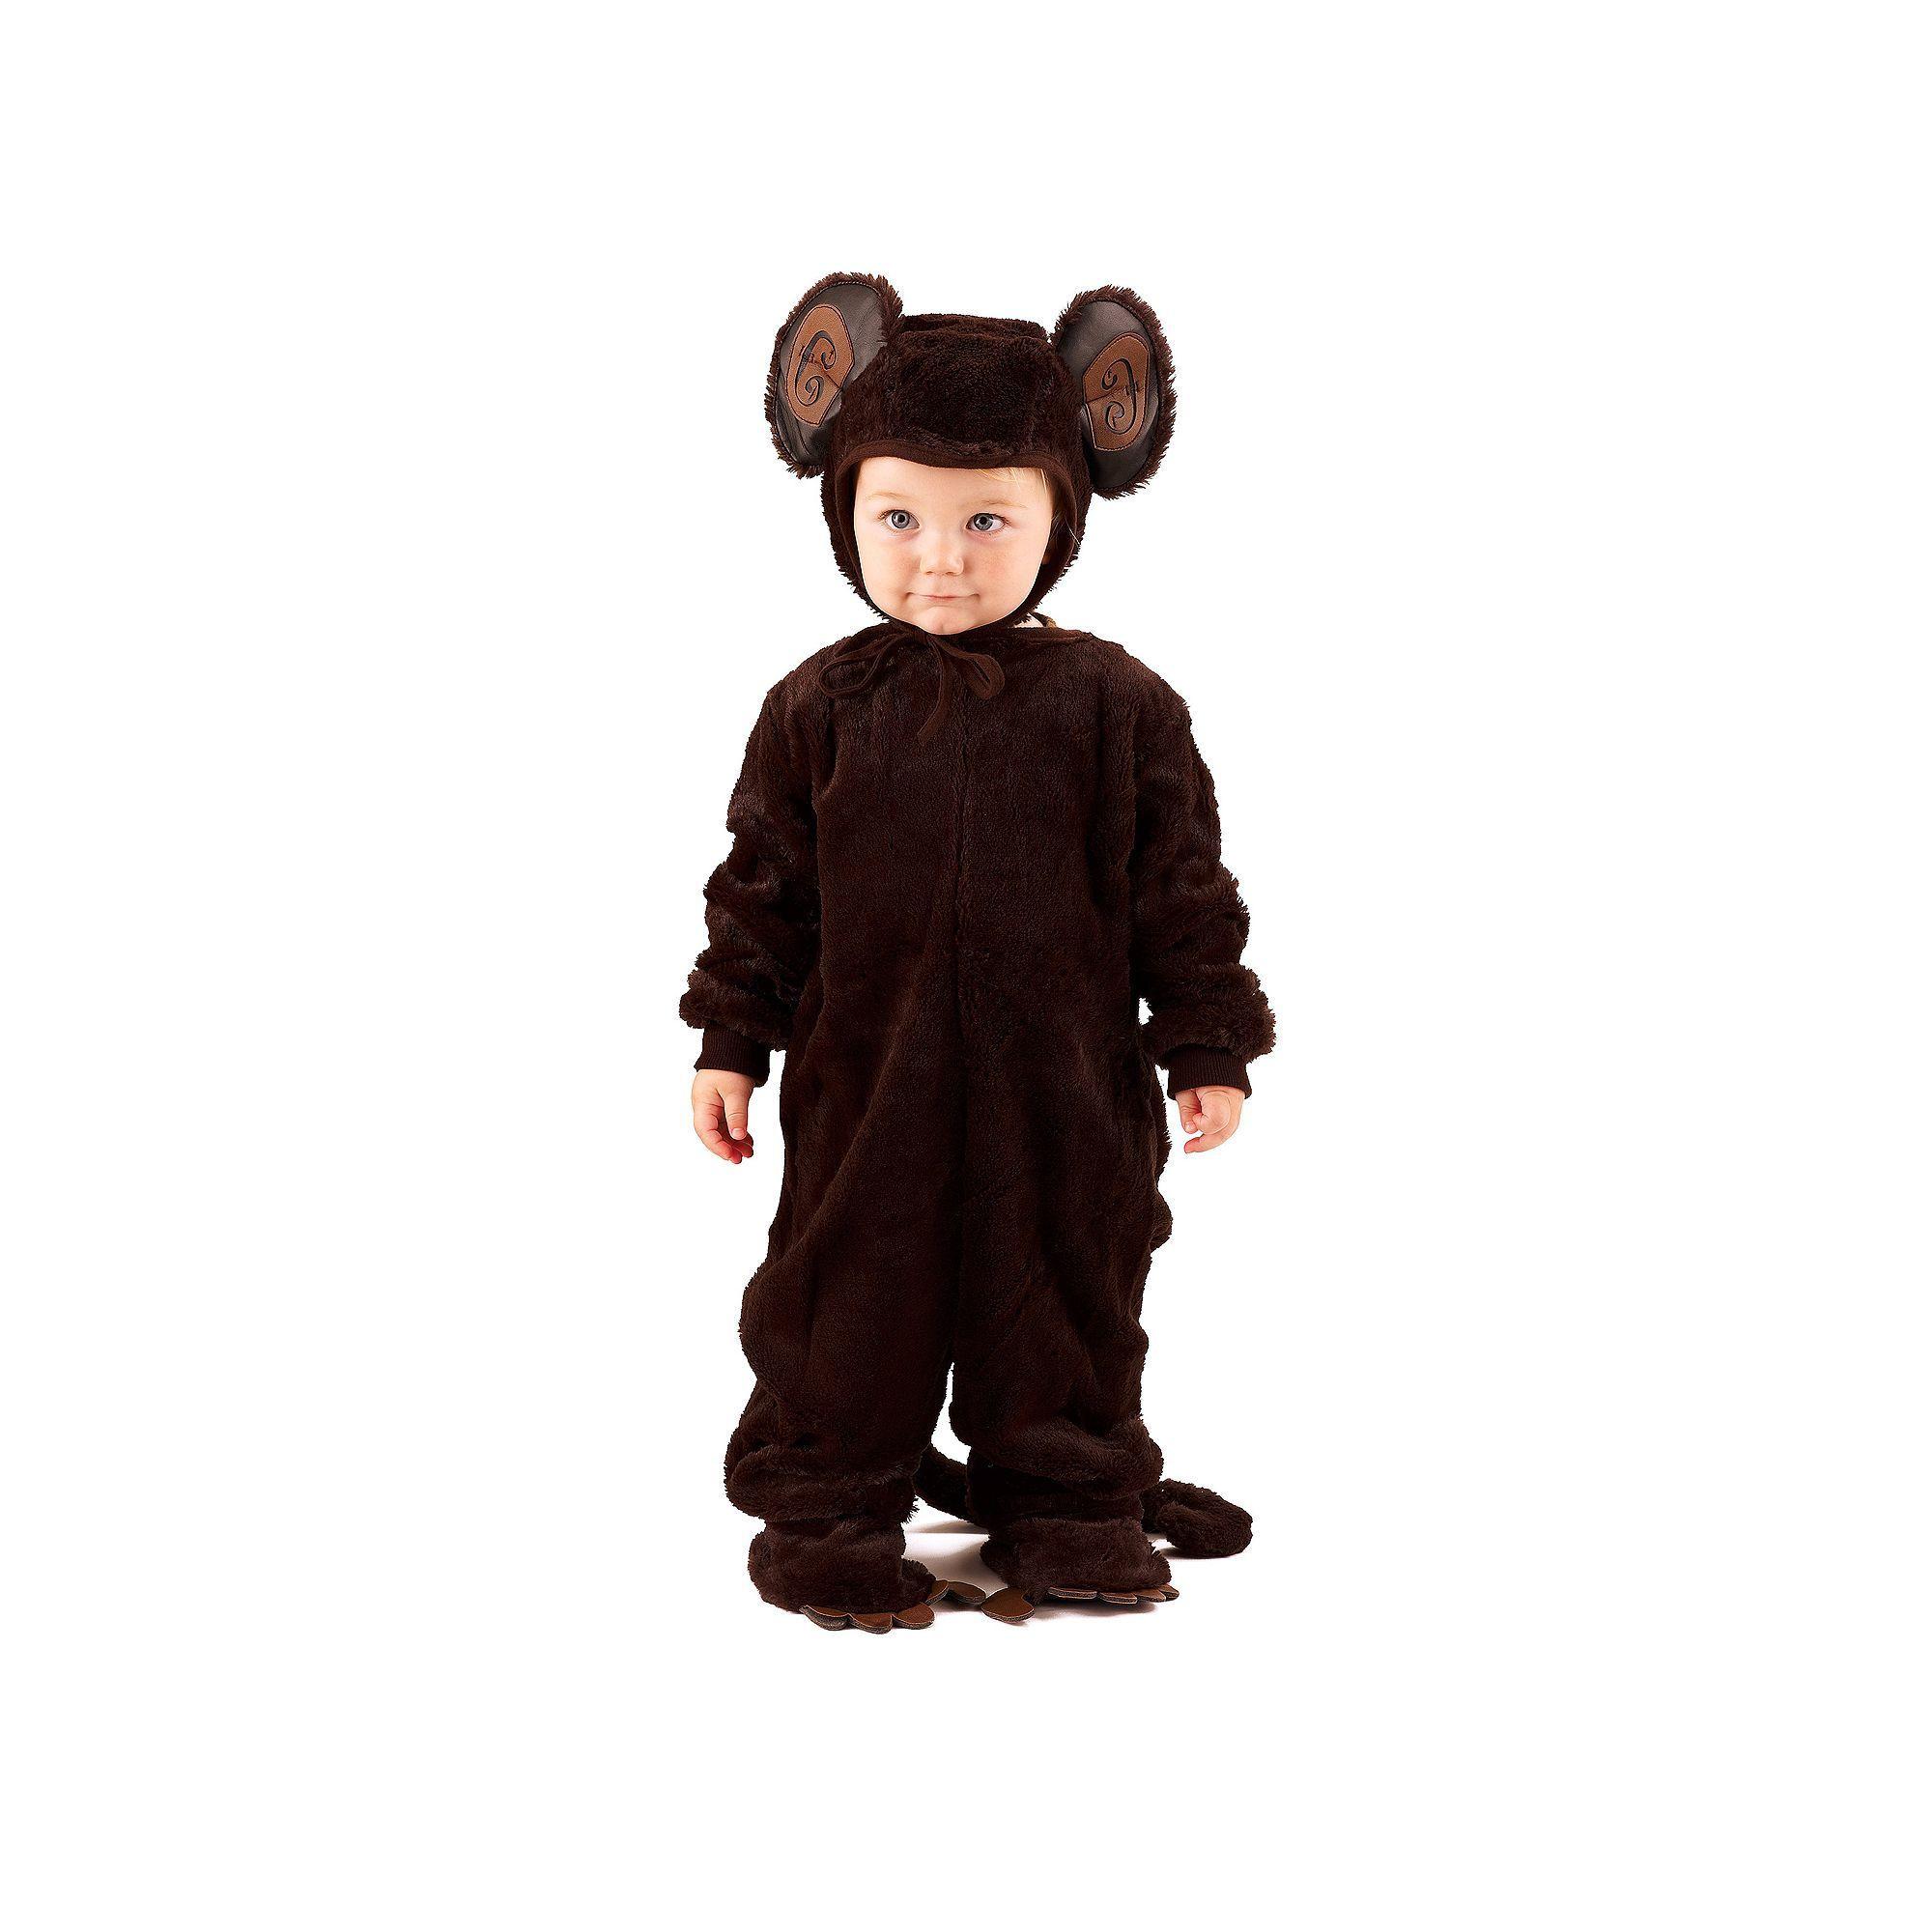 Plush Monkey Costume - Kids, Kids Unisex, Size: XS, Brown | Monkey ...